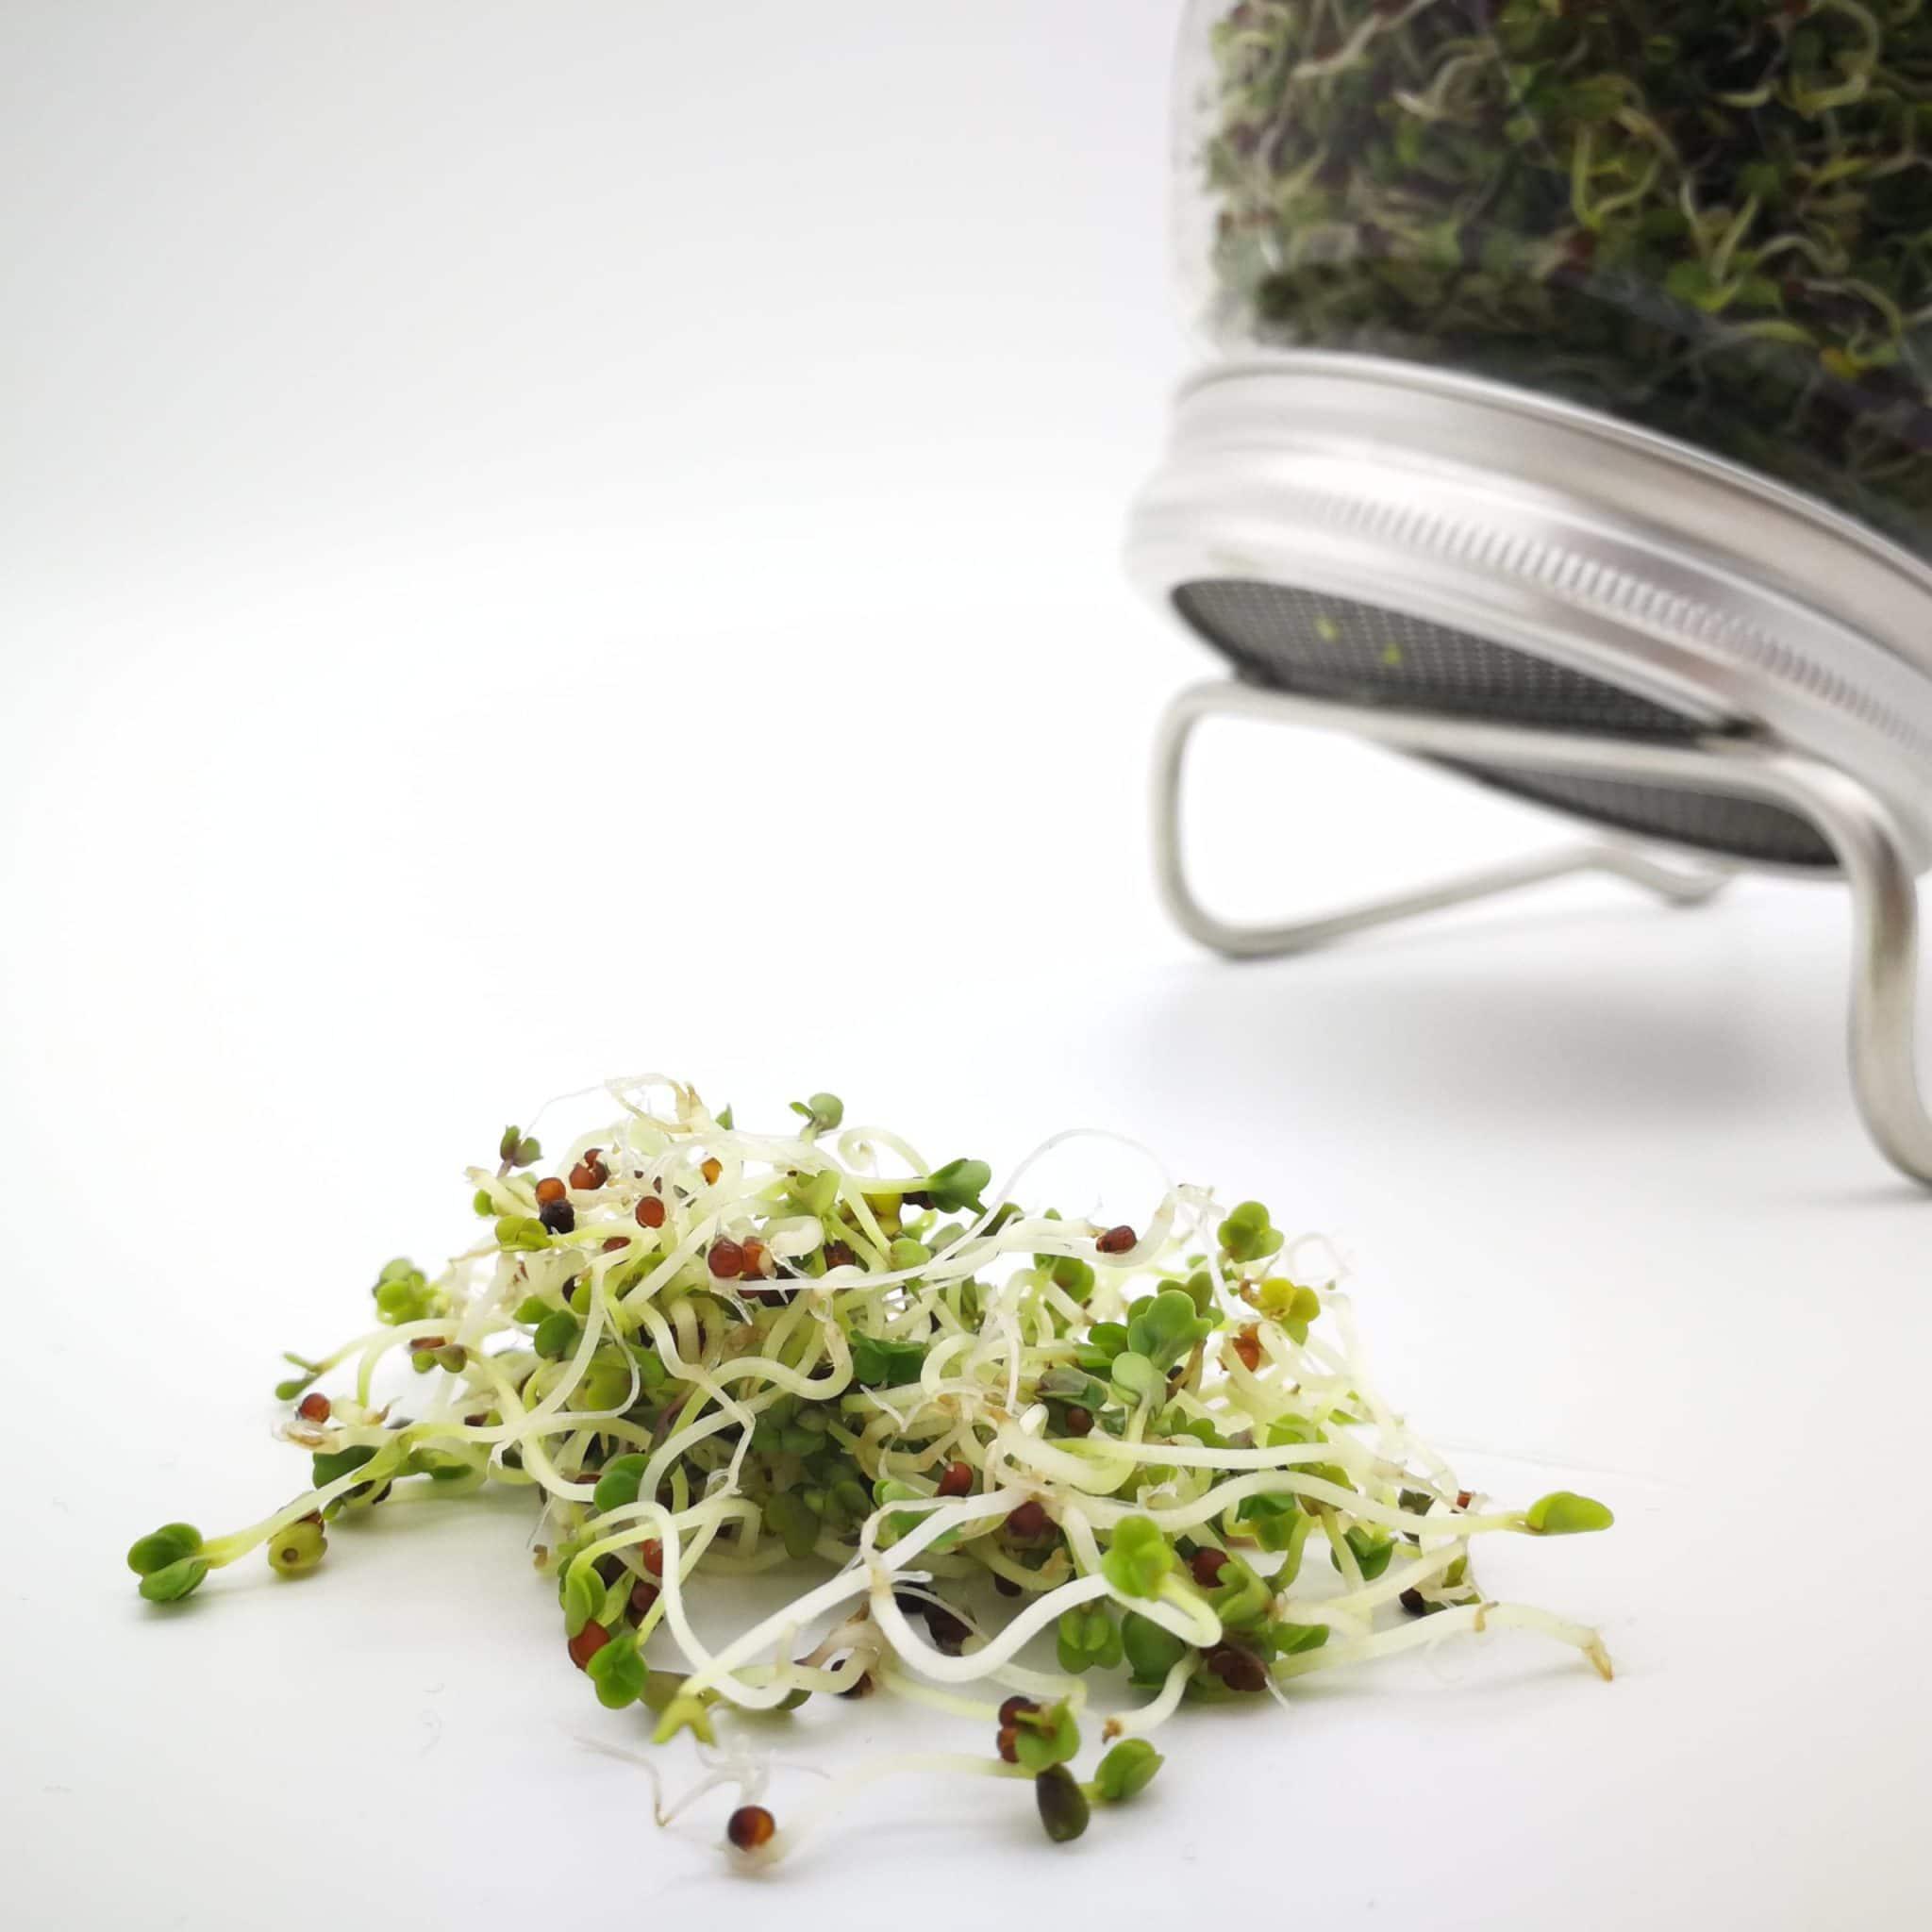 Bio-Sprossen Brokkoli angebaut im Sprossenglas